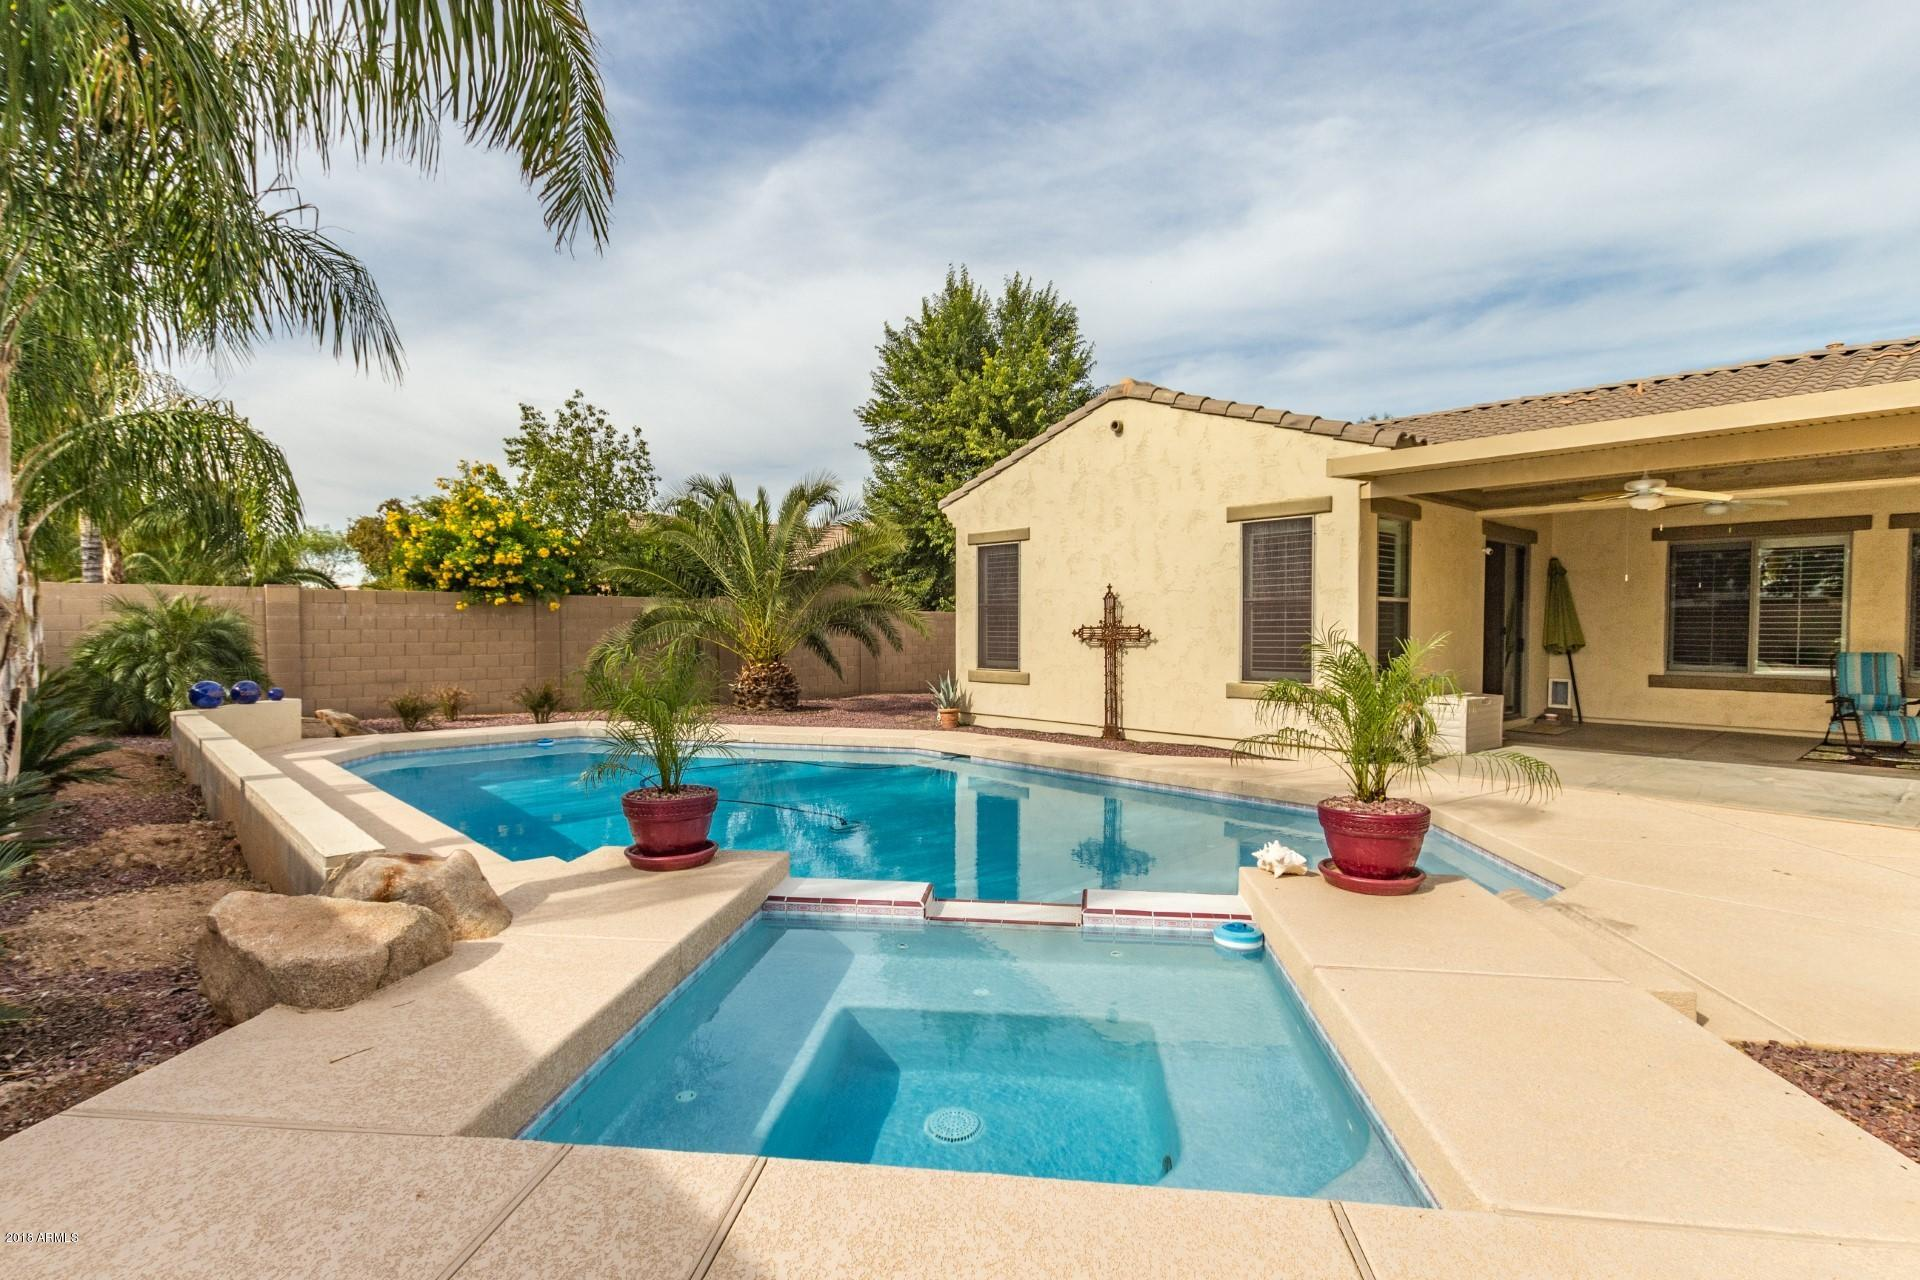 MLS 5849607 8027 W LUKE Avenue, Glendale, AZ 85303 Glendale AZ Gated